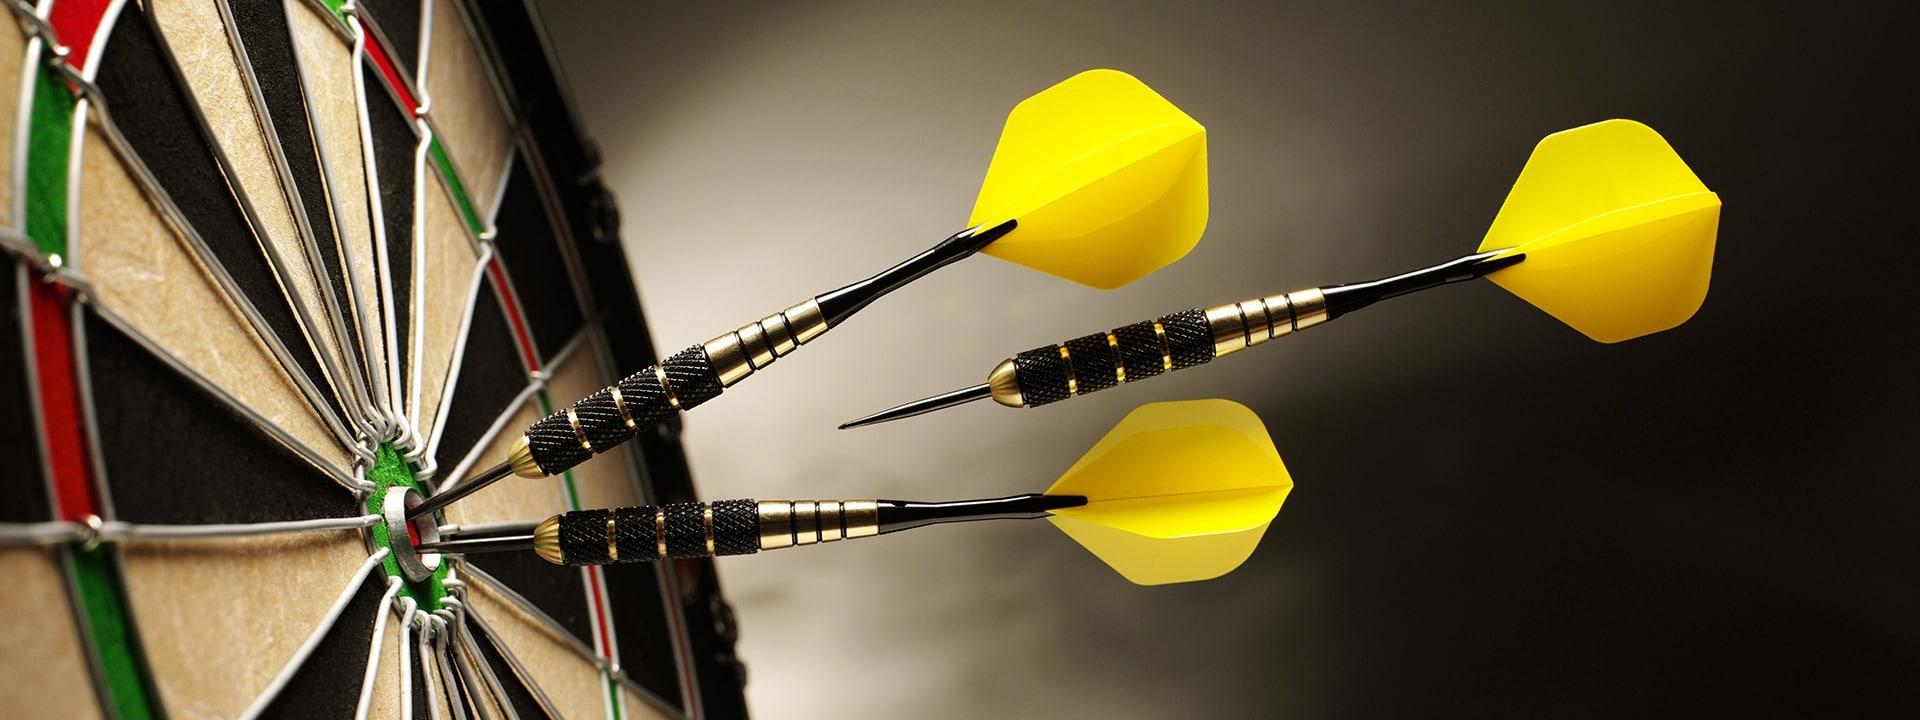 Creating customer loyalty through target marketing